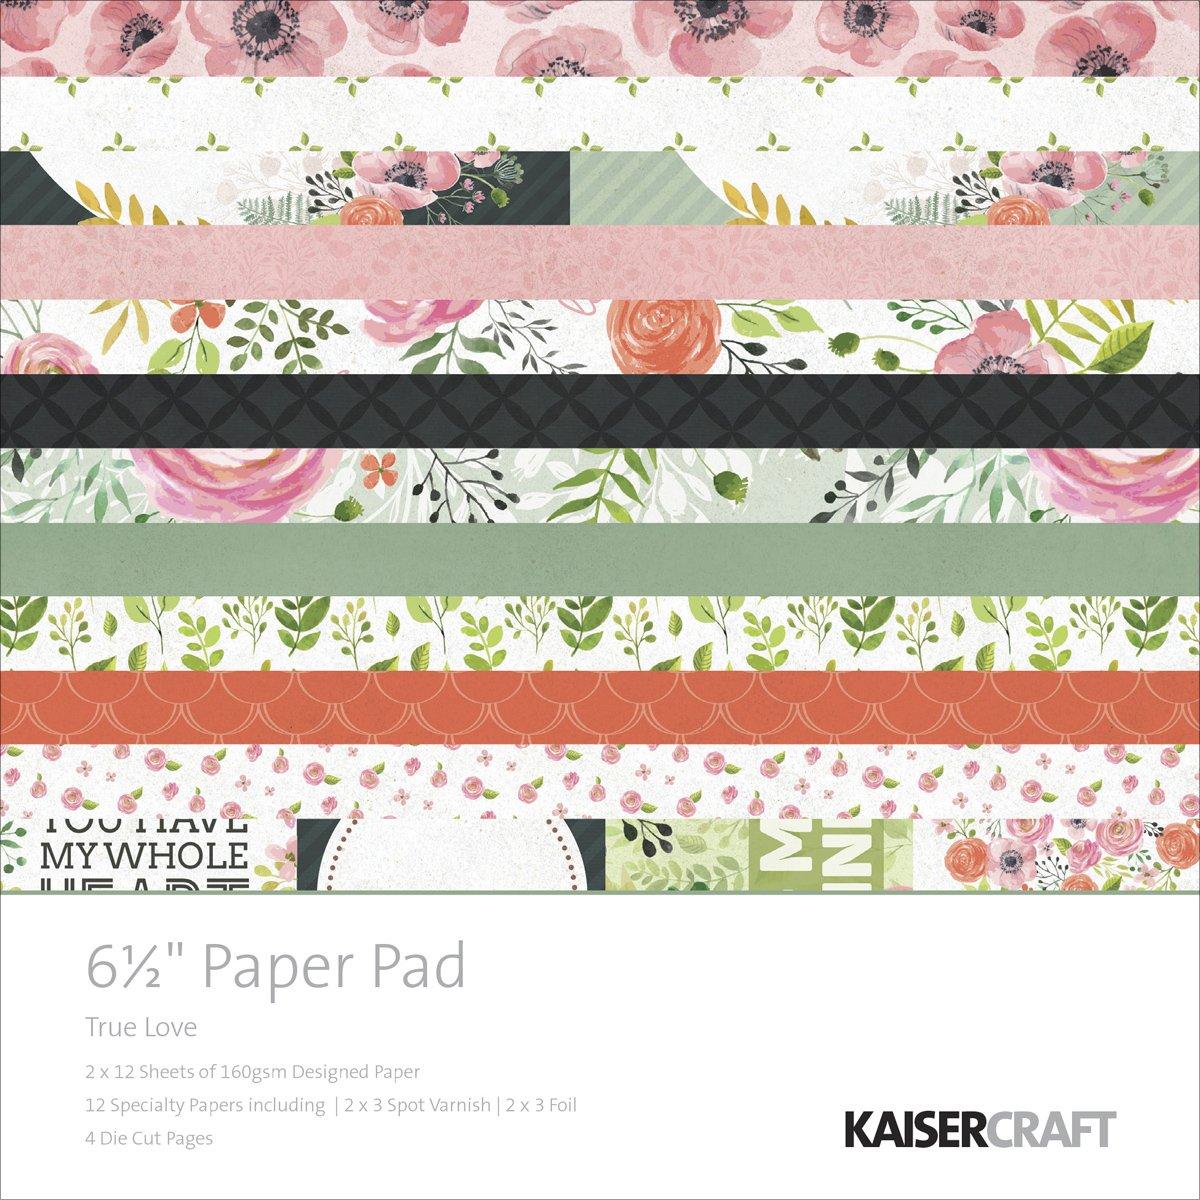 Kaisercraft Paper Pad 6,5 x 6,5 40 40 40 Pkg True Love B017JNYJ2K  | Verrückte Preis  3c9837